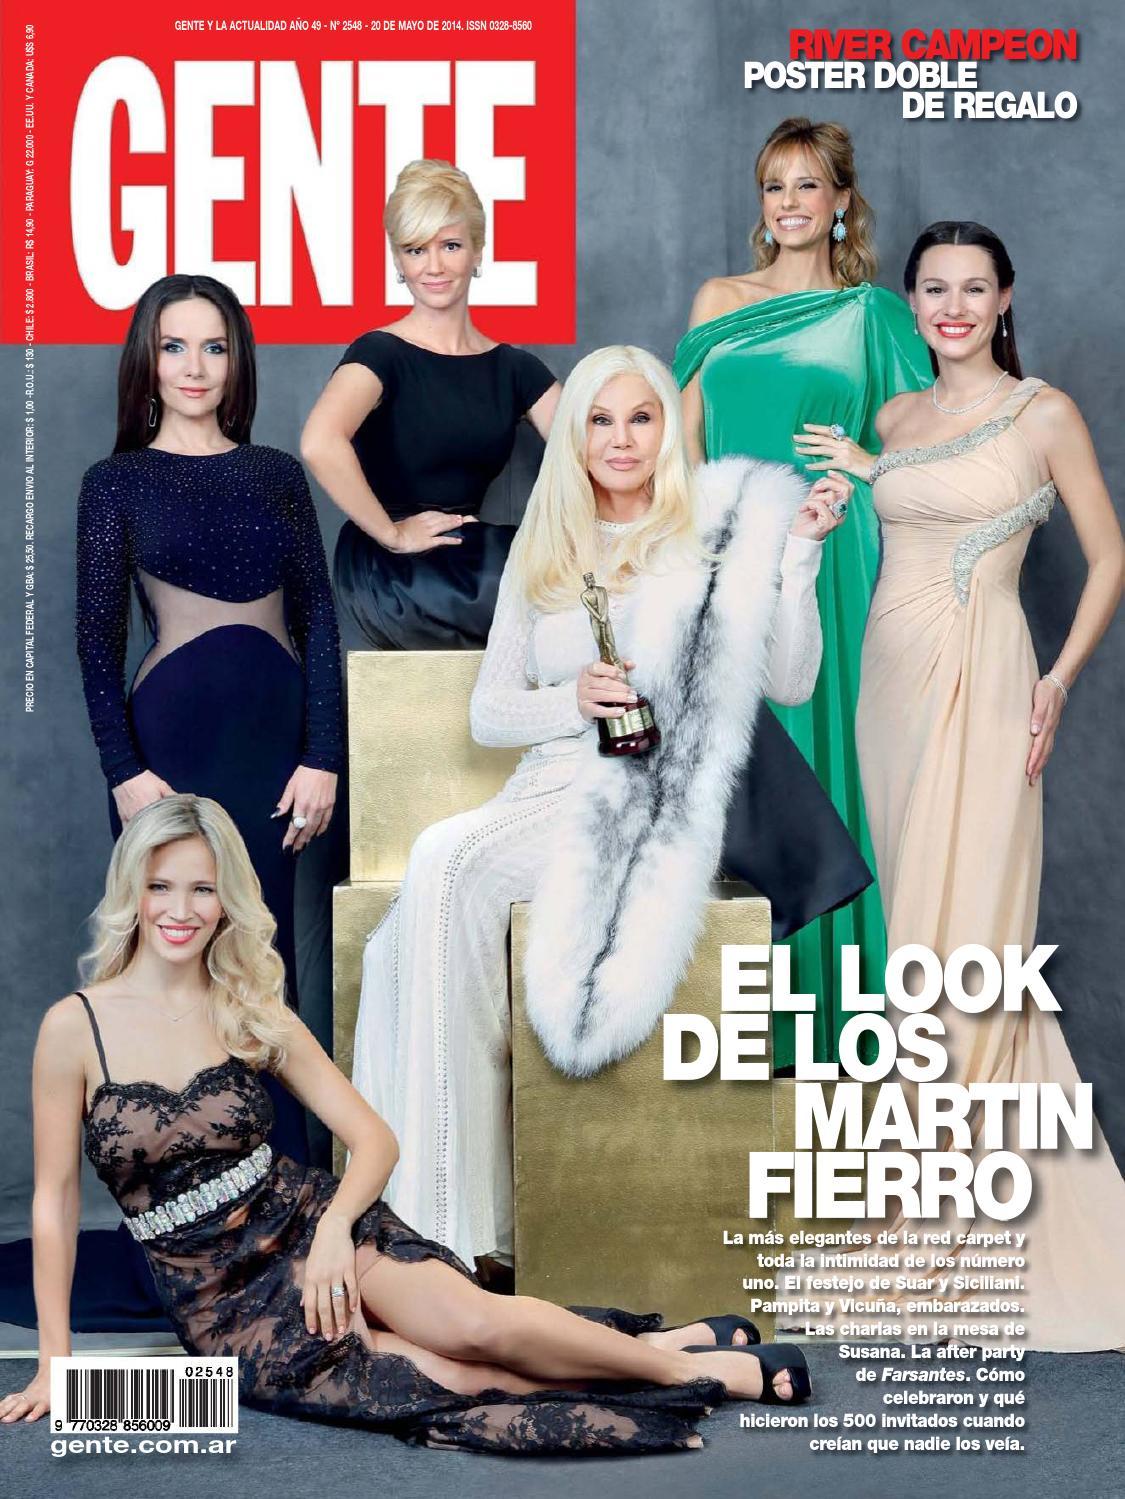 Argentina Pelicula Porno gente argentina #2548jarutka - issuu